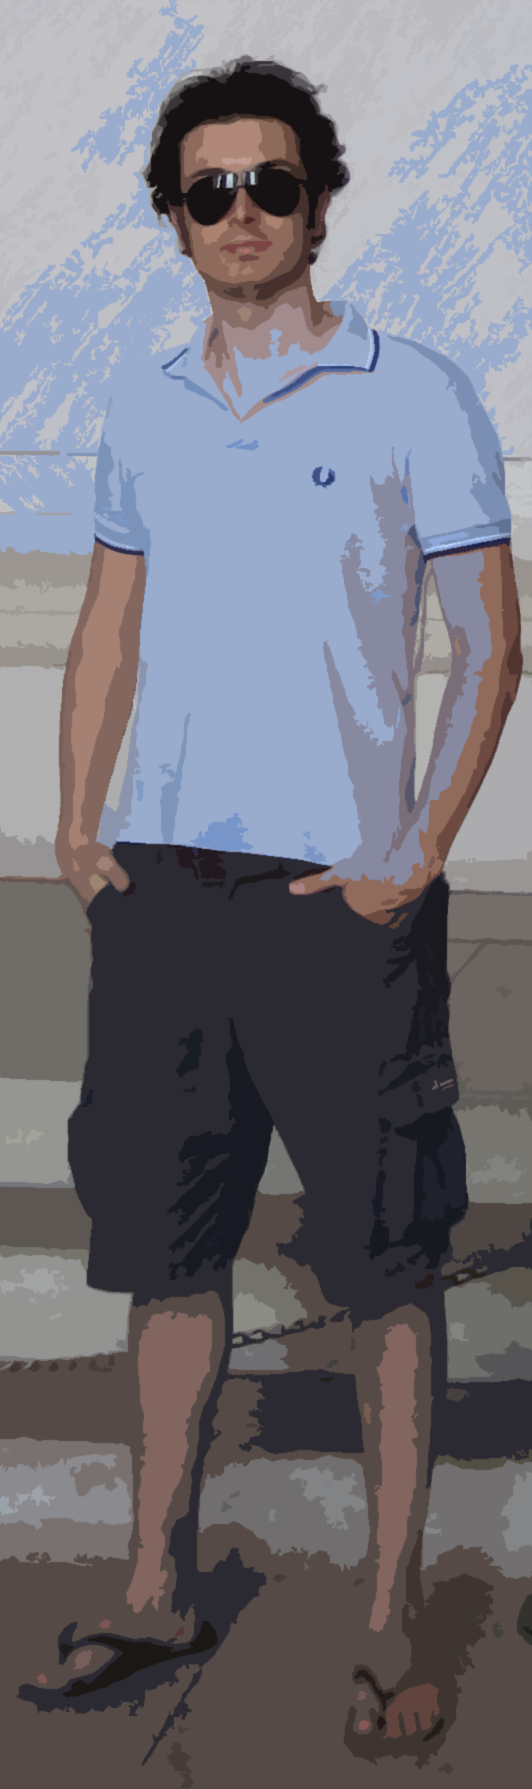 bygui86's Profile Picture